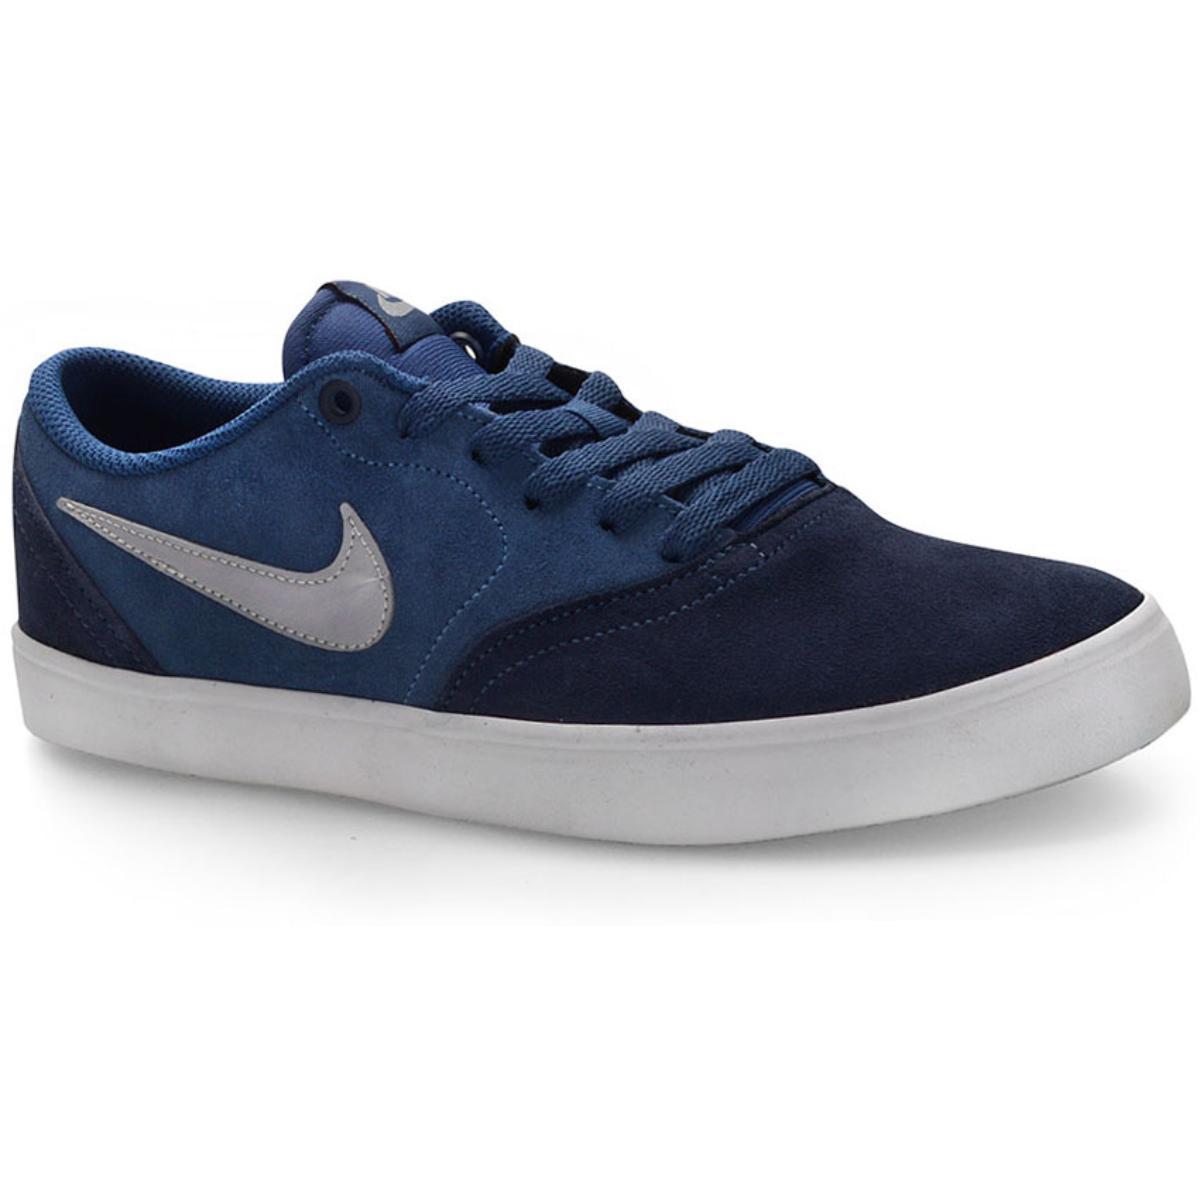 Tenis Nike Sb Check Solar - 843895-407